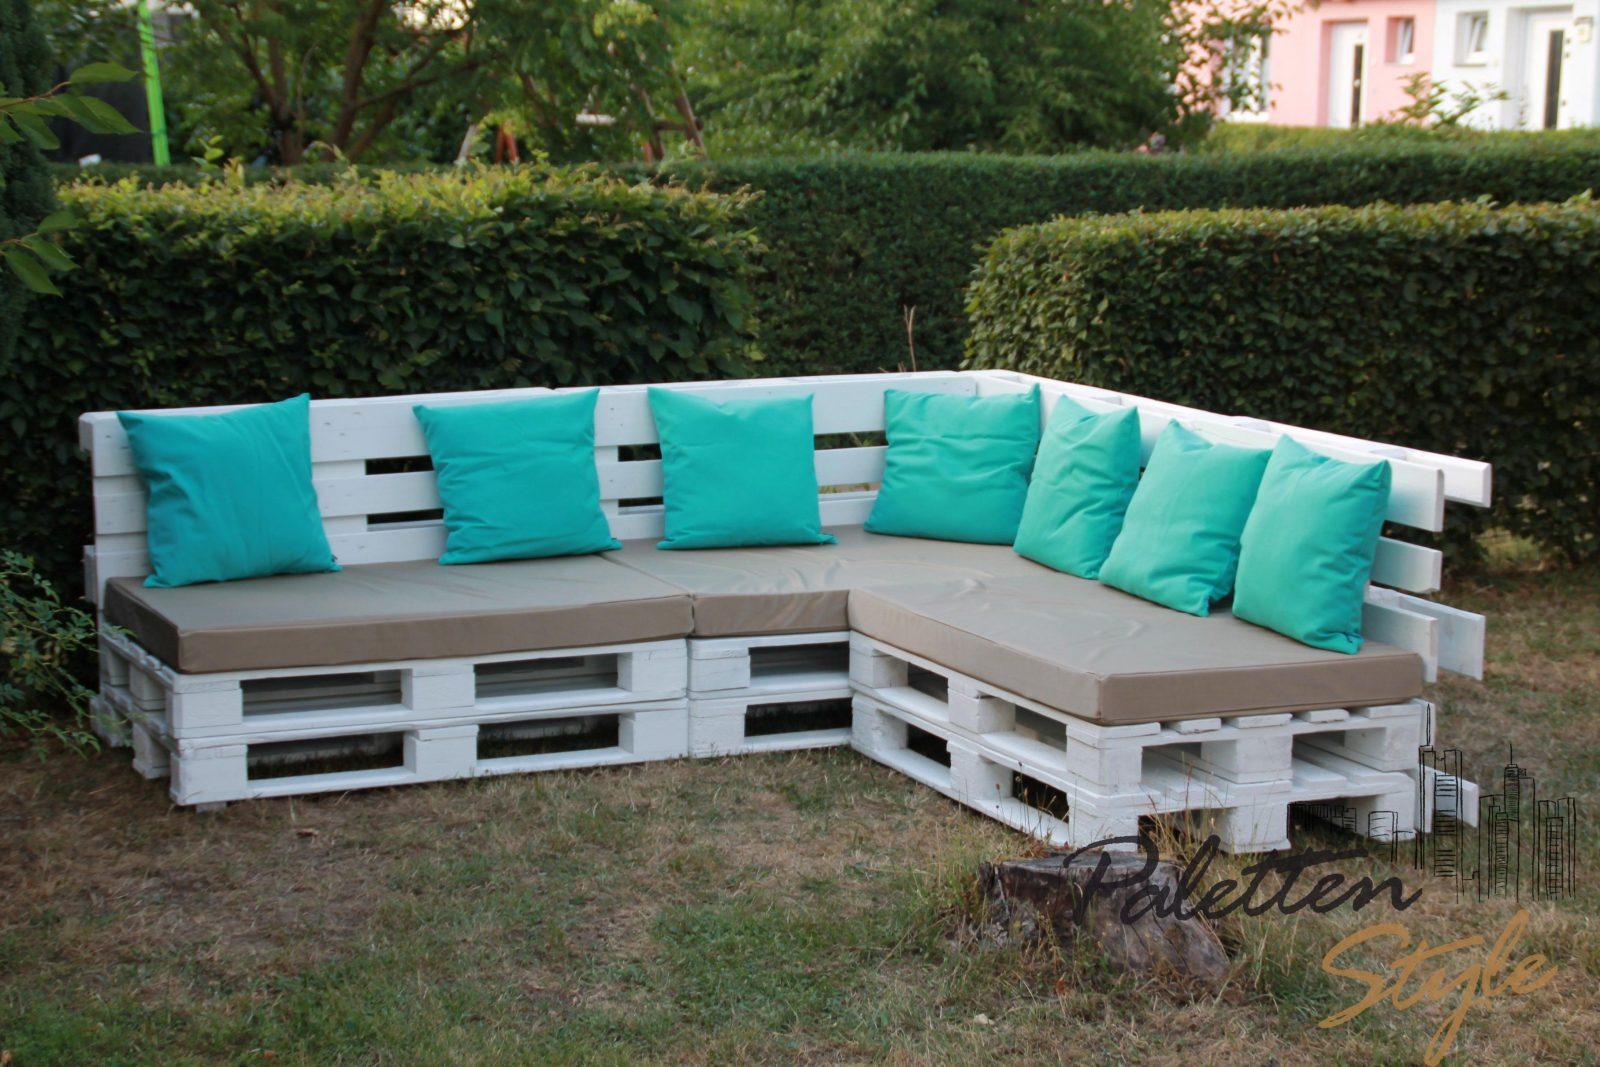 Lounge Sofa Selber Bauen 25 With Lounge Sofa Selber Bauen  Bürostuhl von Lounge Sofa Selber Bauen Photo